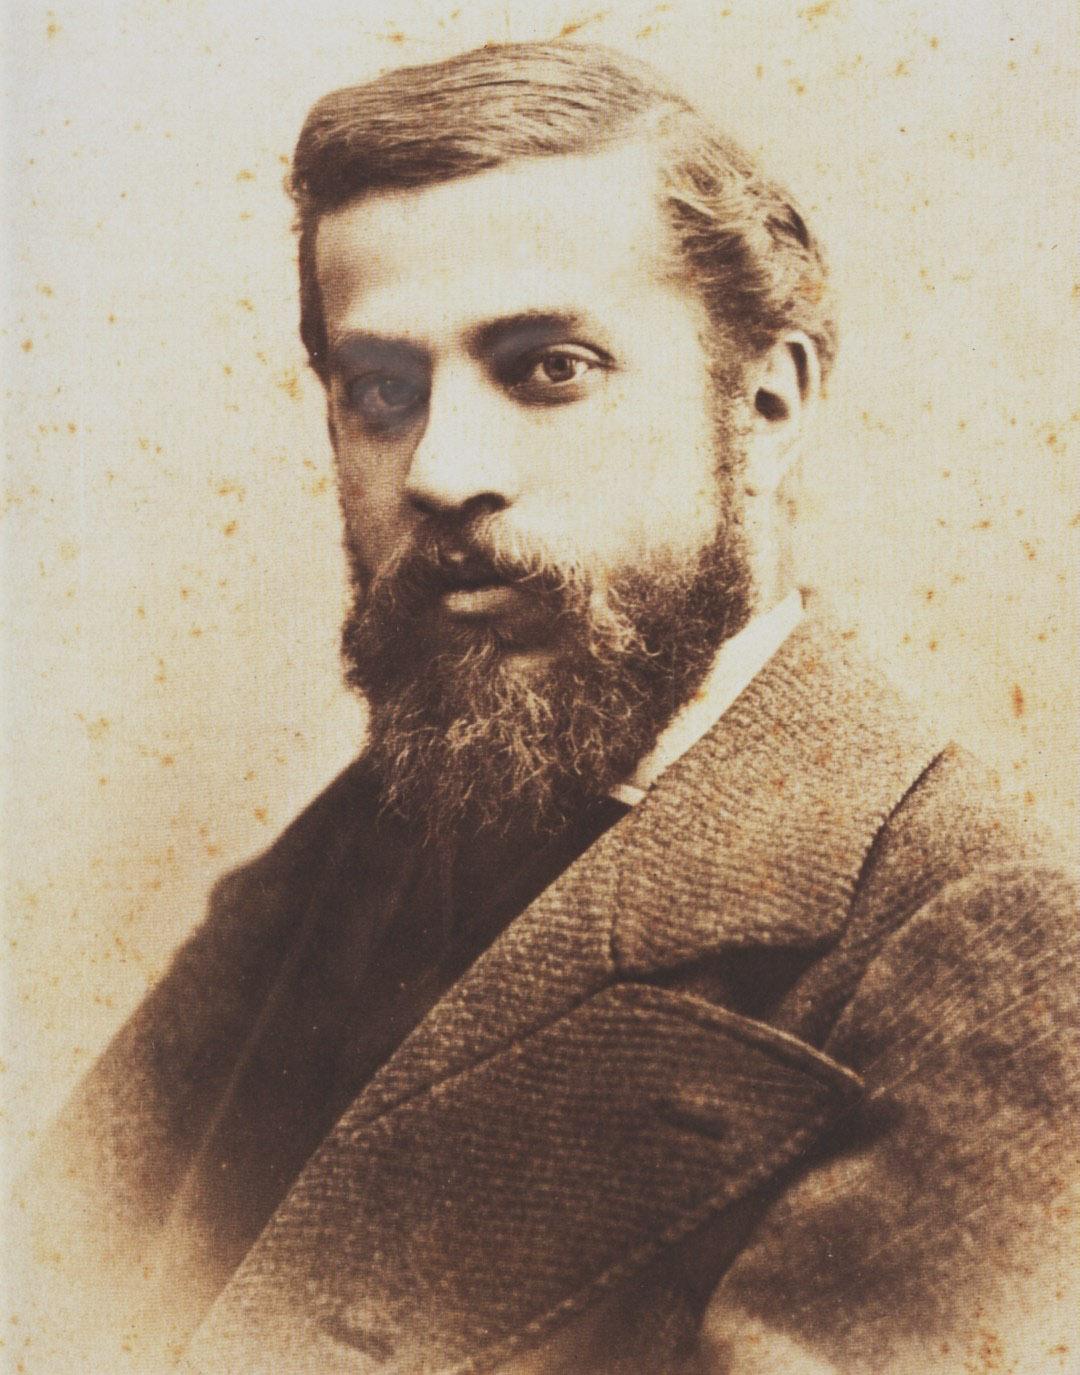 Antonio Gaudí (Creative Commons).